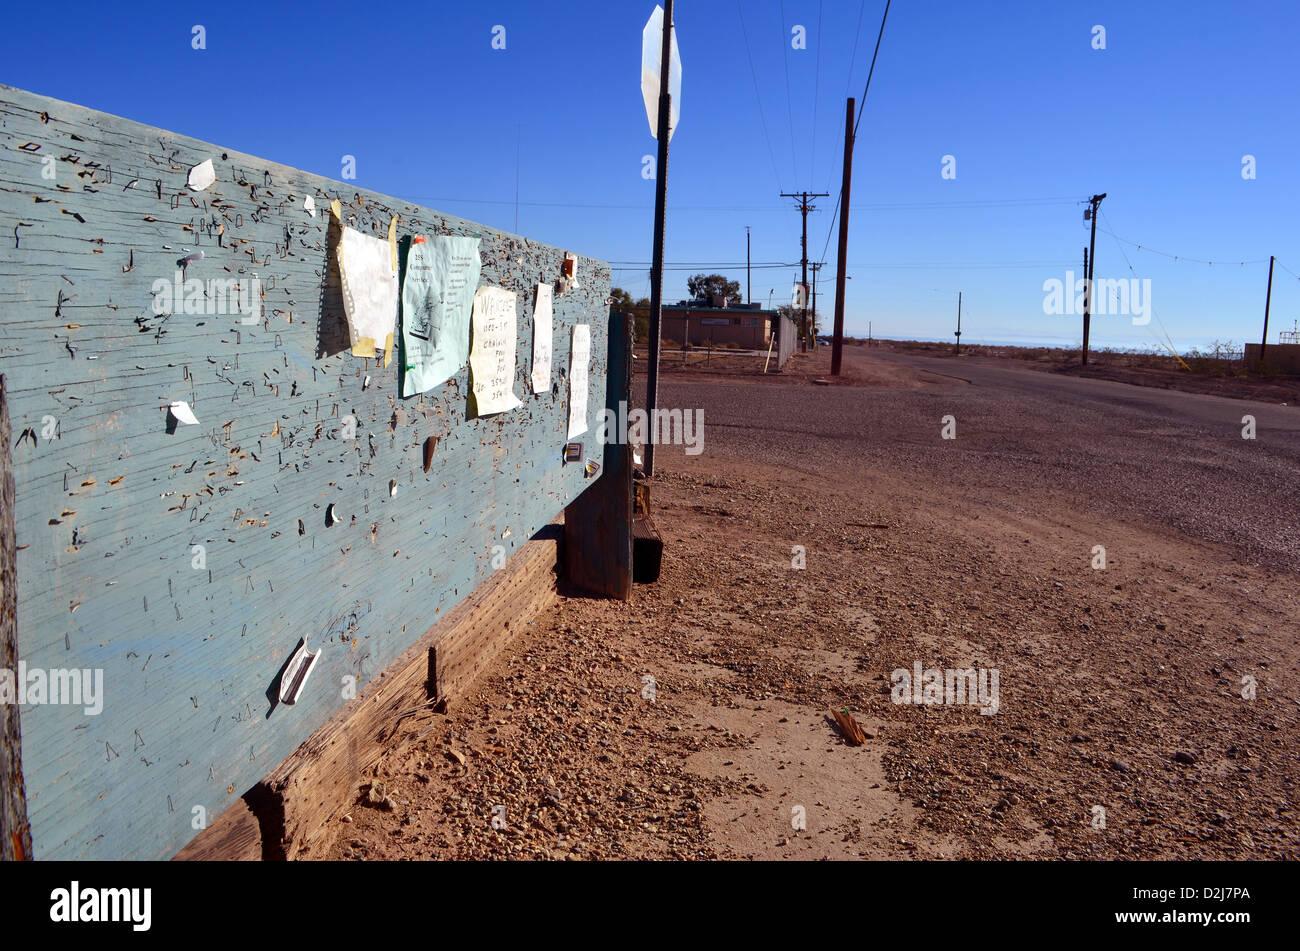 Roadside noticeboard in the desert at the Salton Sea, California. - Stock Image